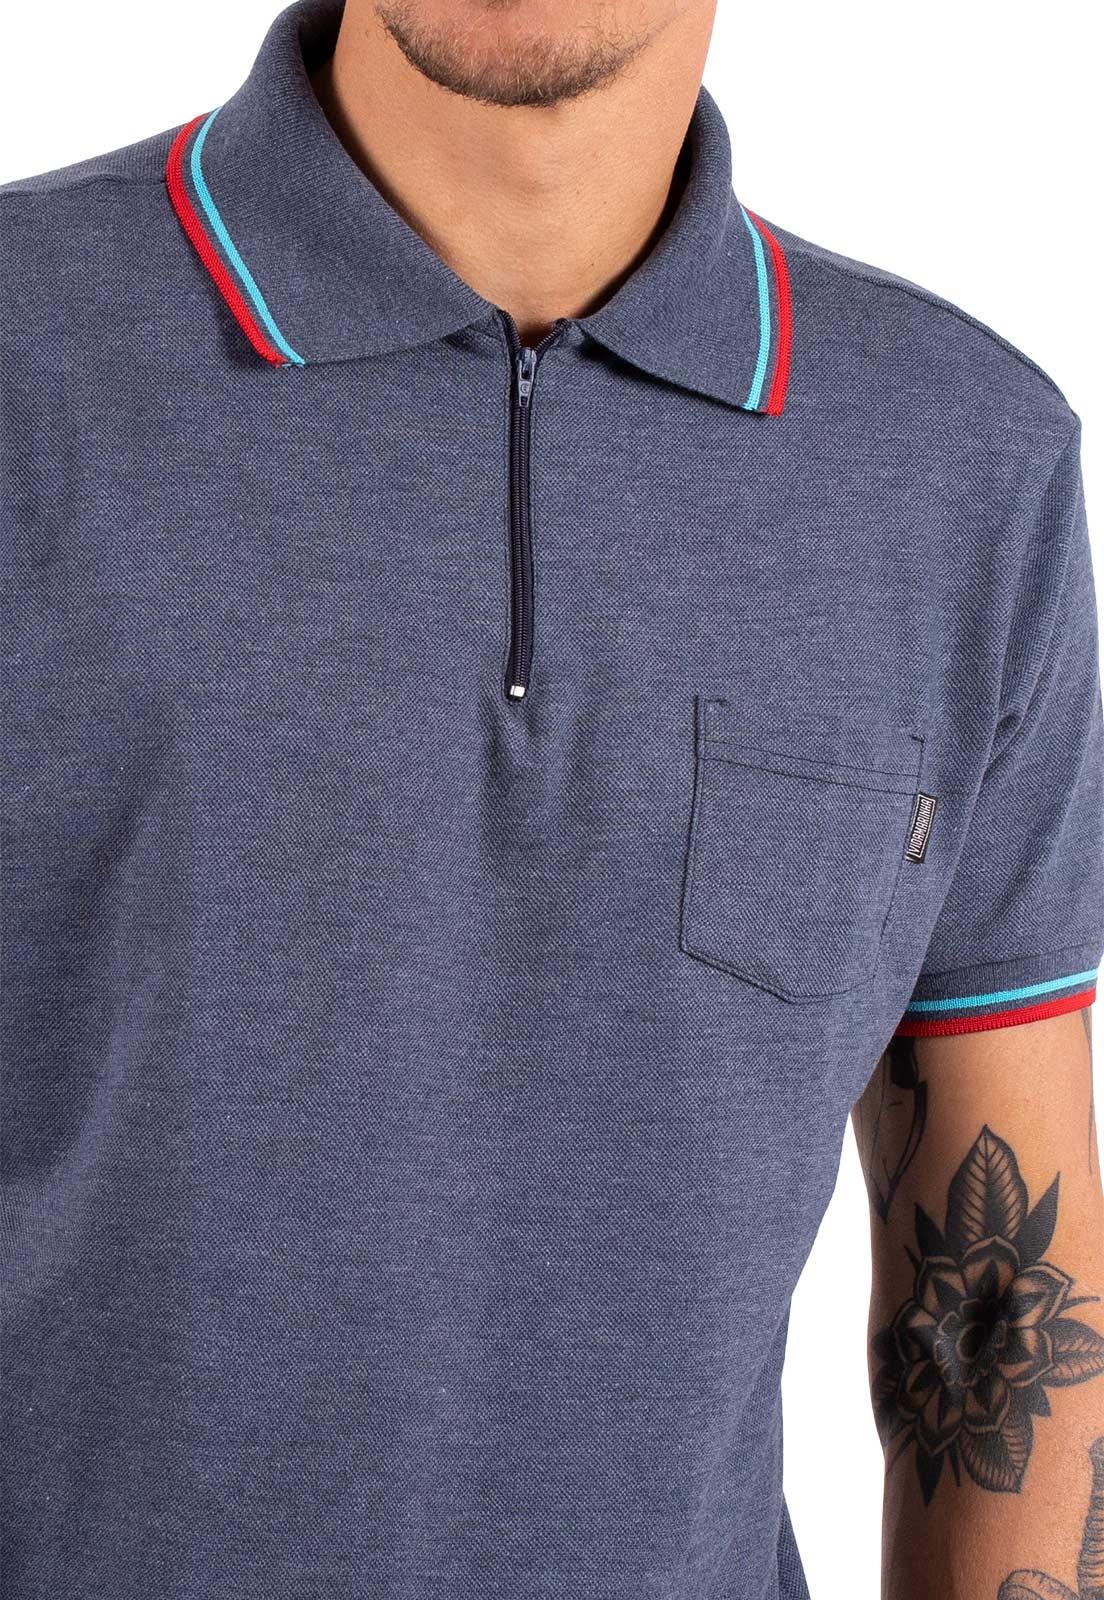 Camisa Polo Vida Marinha Manga Curta Azul